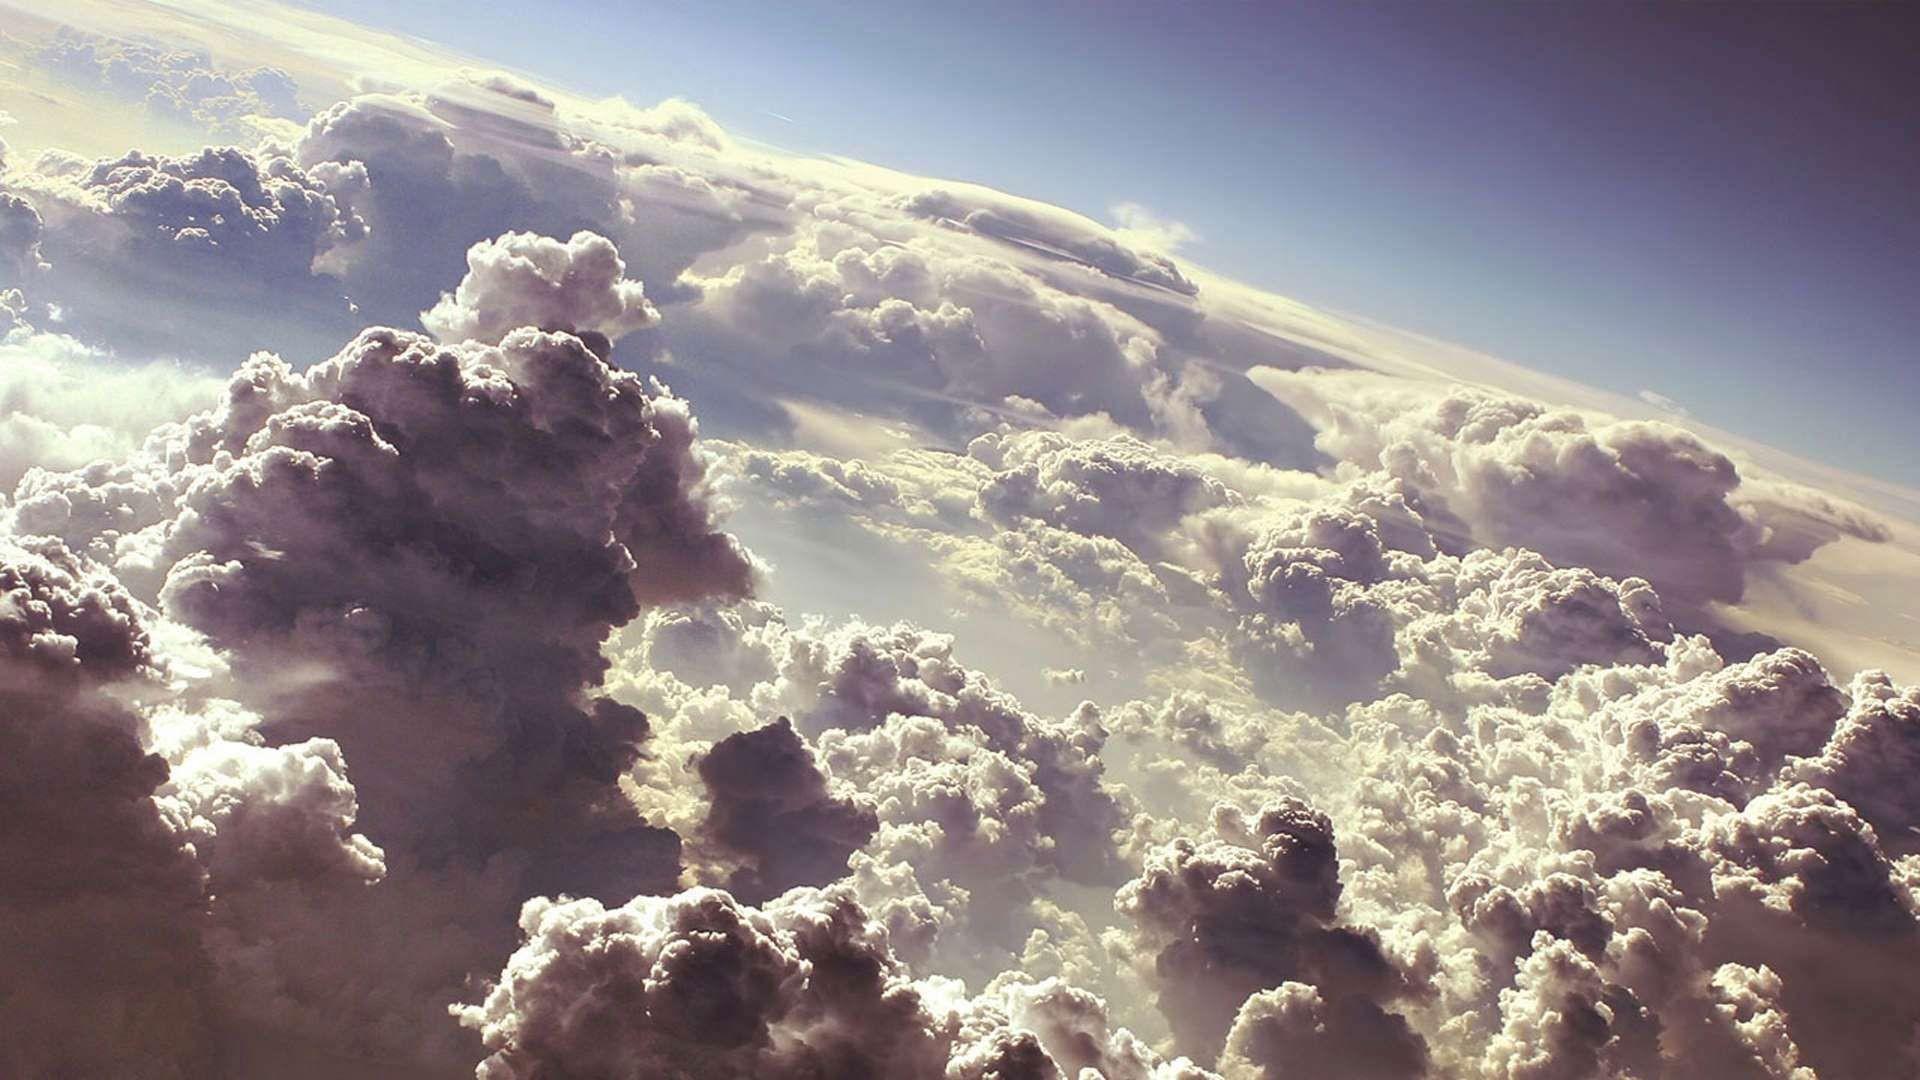 Res: 1920x1080, hd pics photos stunning attractive clouds 5 hd desktop background wallpaper